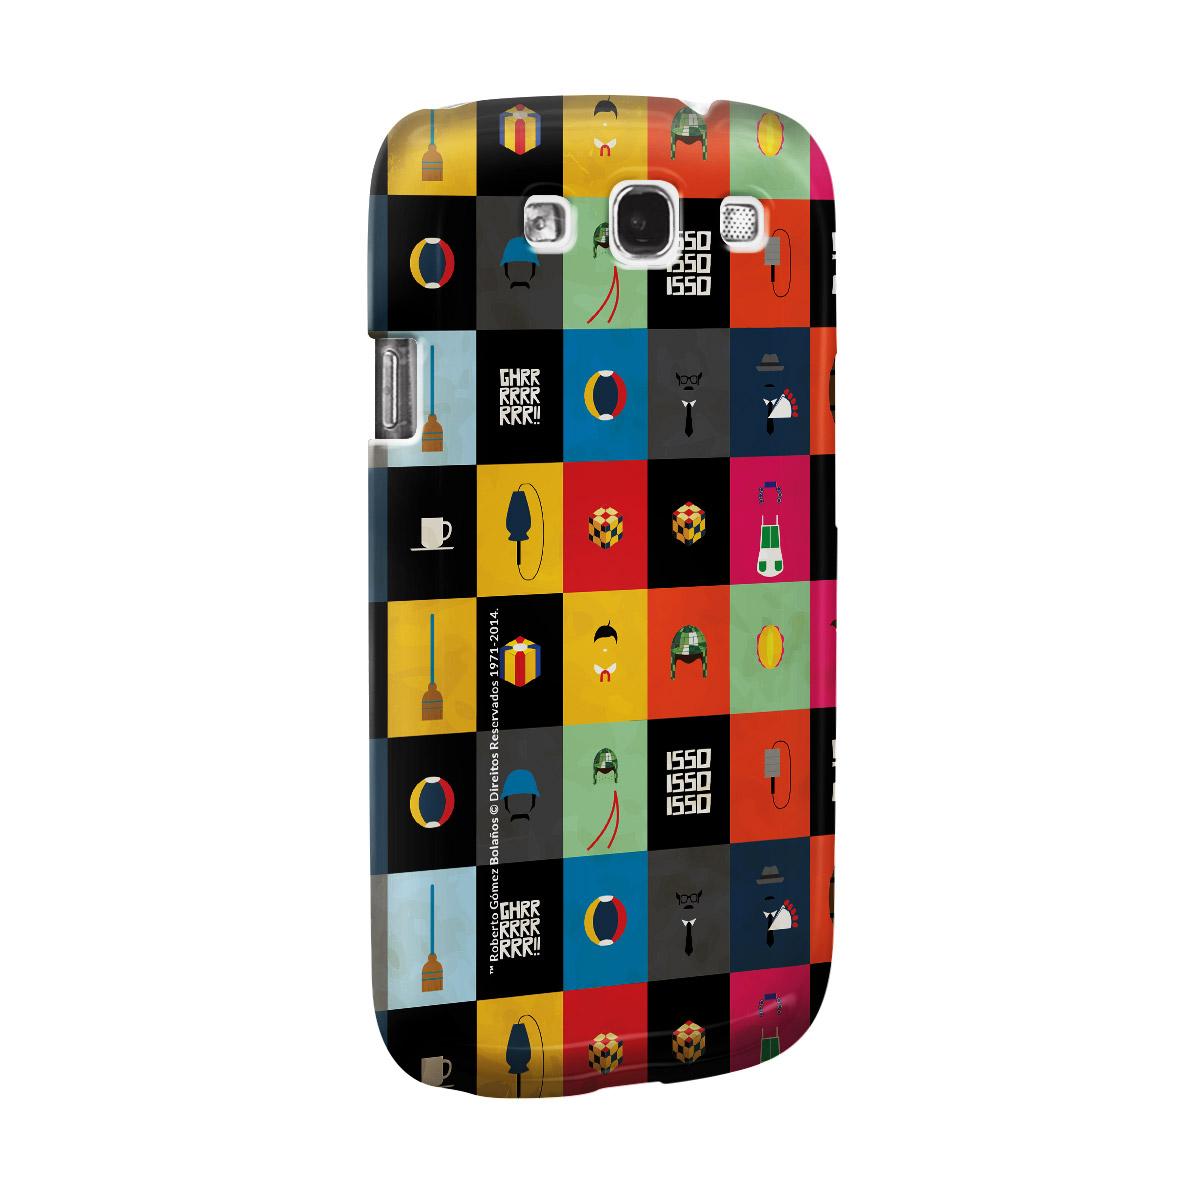 Capa de Celular Samsung Galaxy S3 Chaves �cones Turma do Chaves Vintage